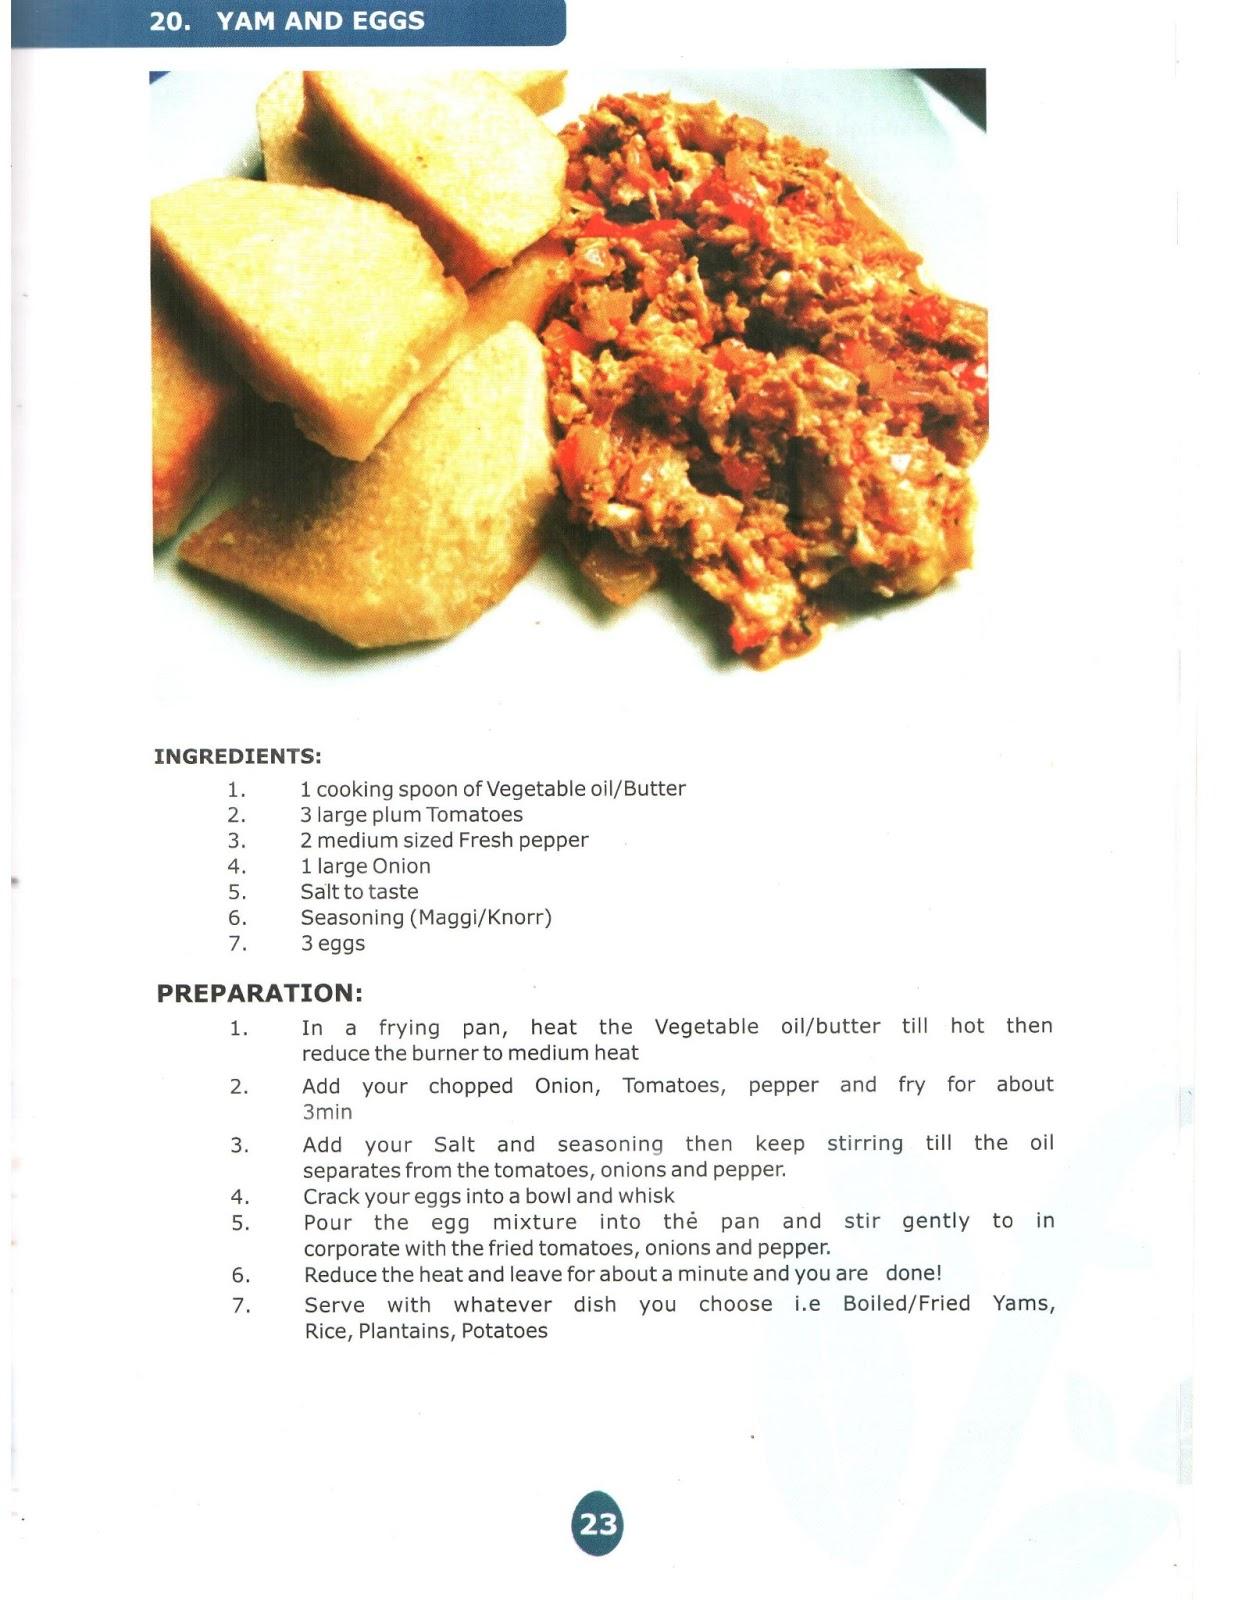 Dobbys signature nigerian food blog i nigerian food recipes i dobbys signature recipe featured in funtuna eggs cook book forumfinder Images